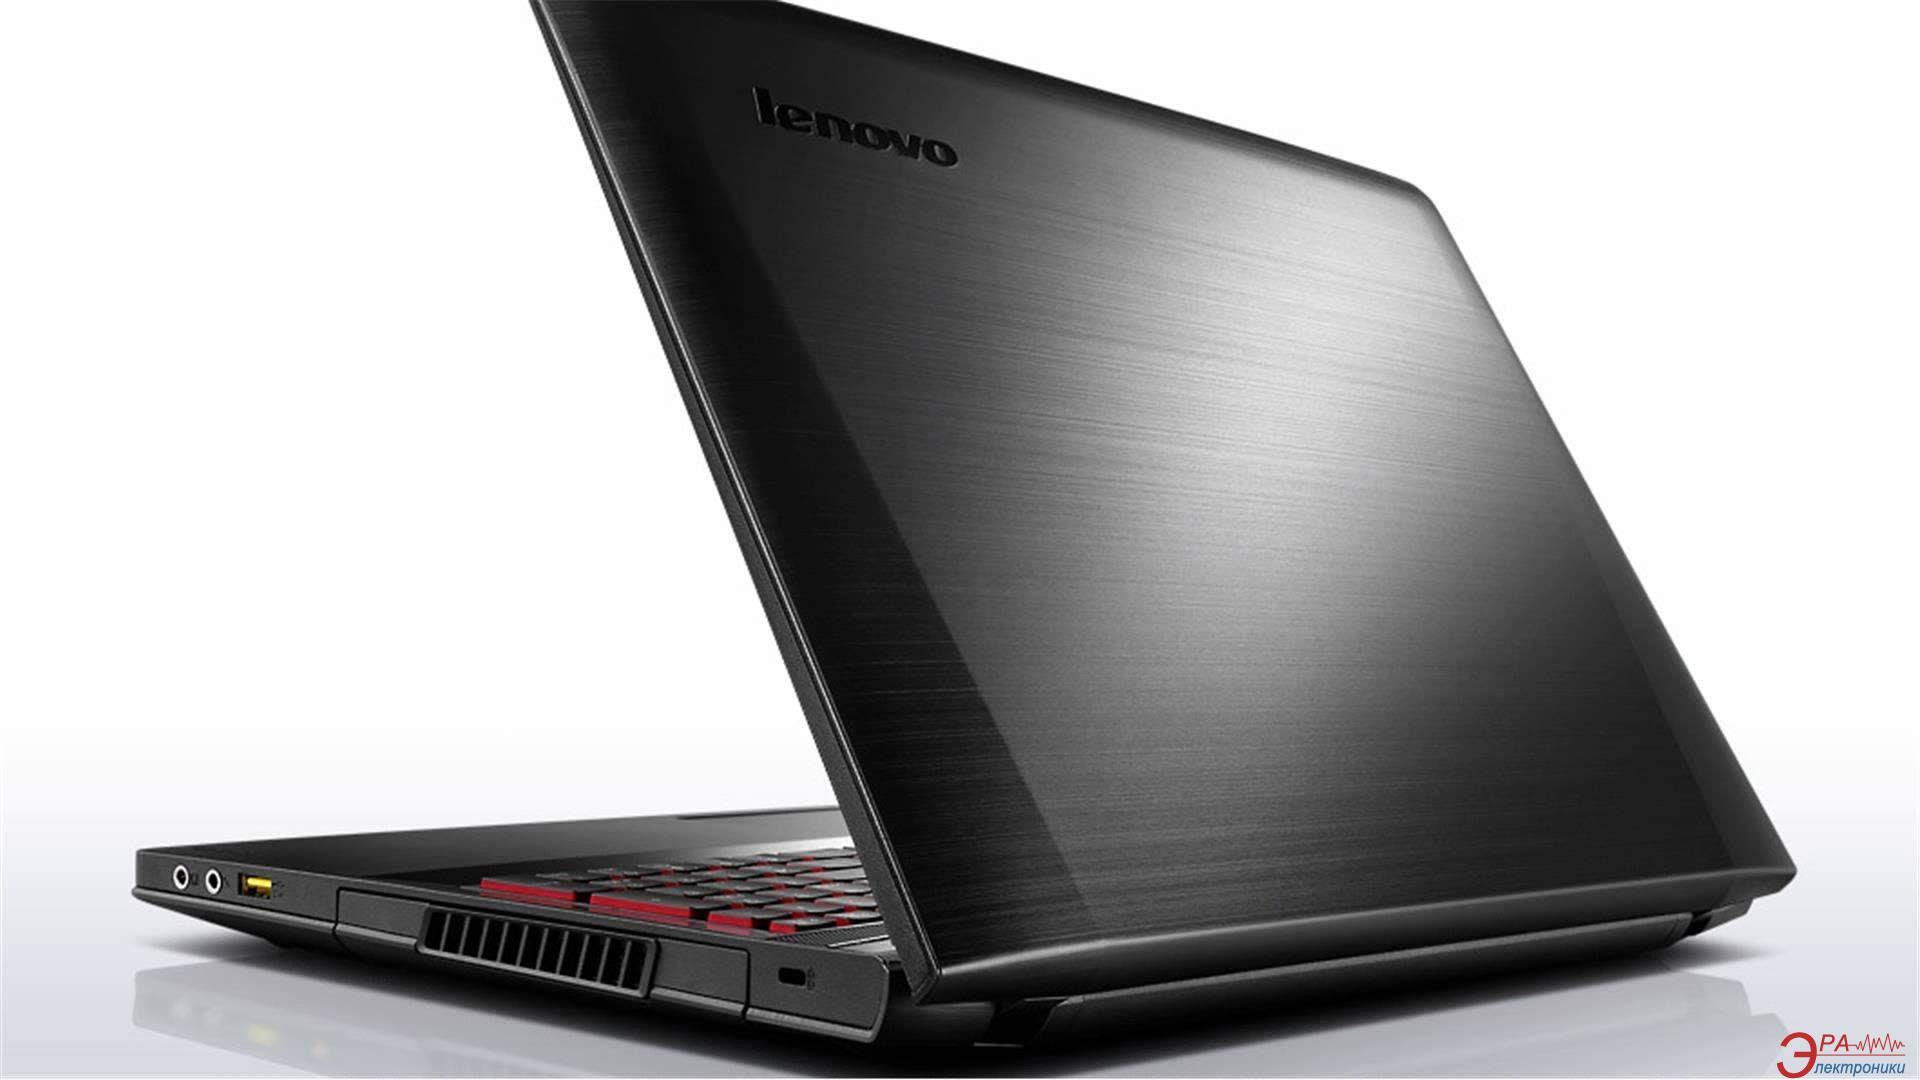 Ноутбук Lenovo IdeaPad 510 (80SR00DJRA) Black 15,6